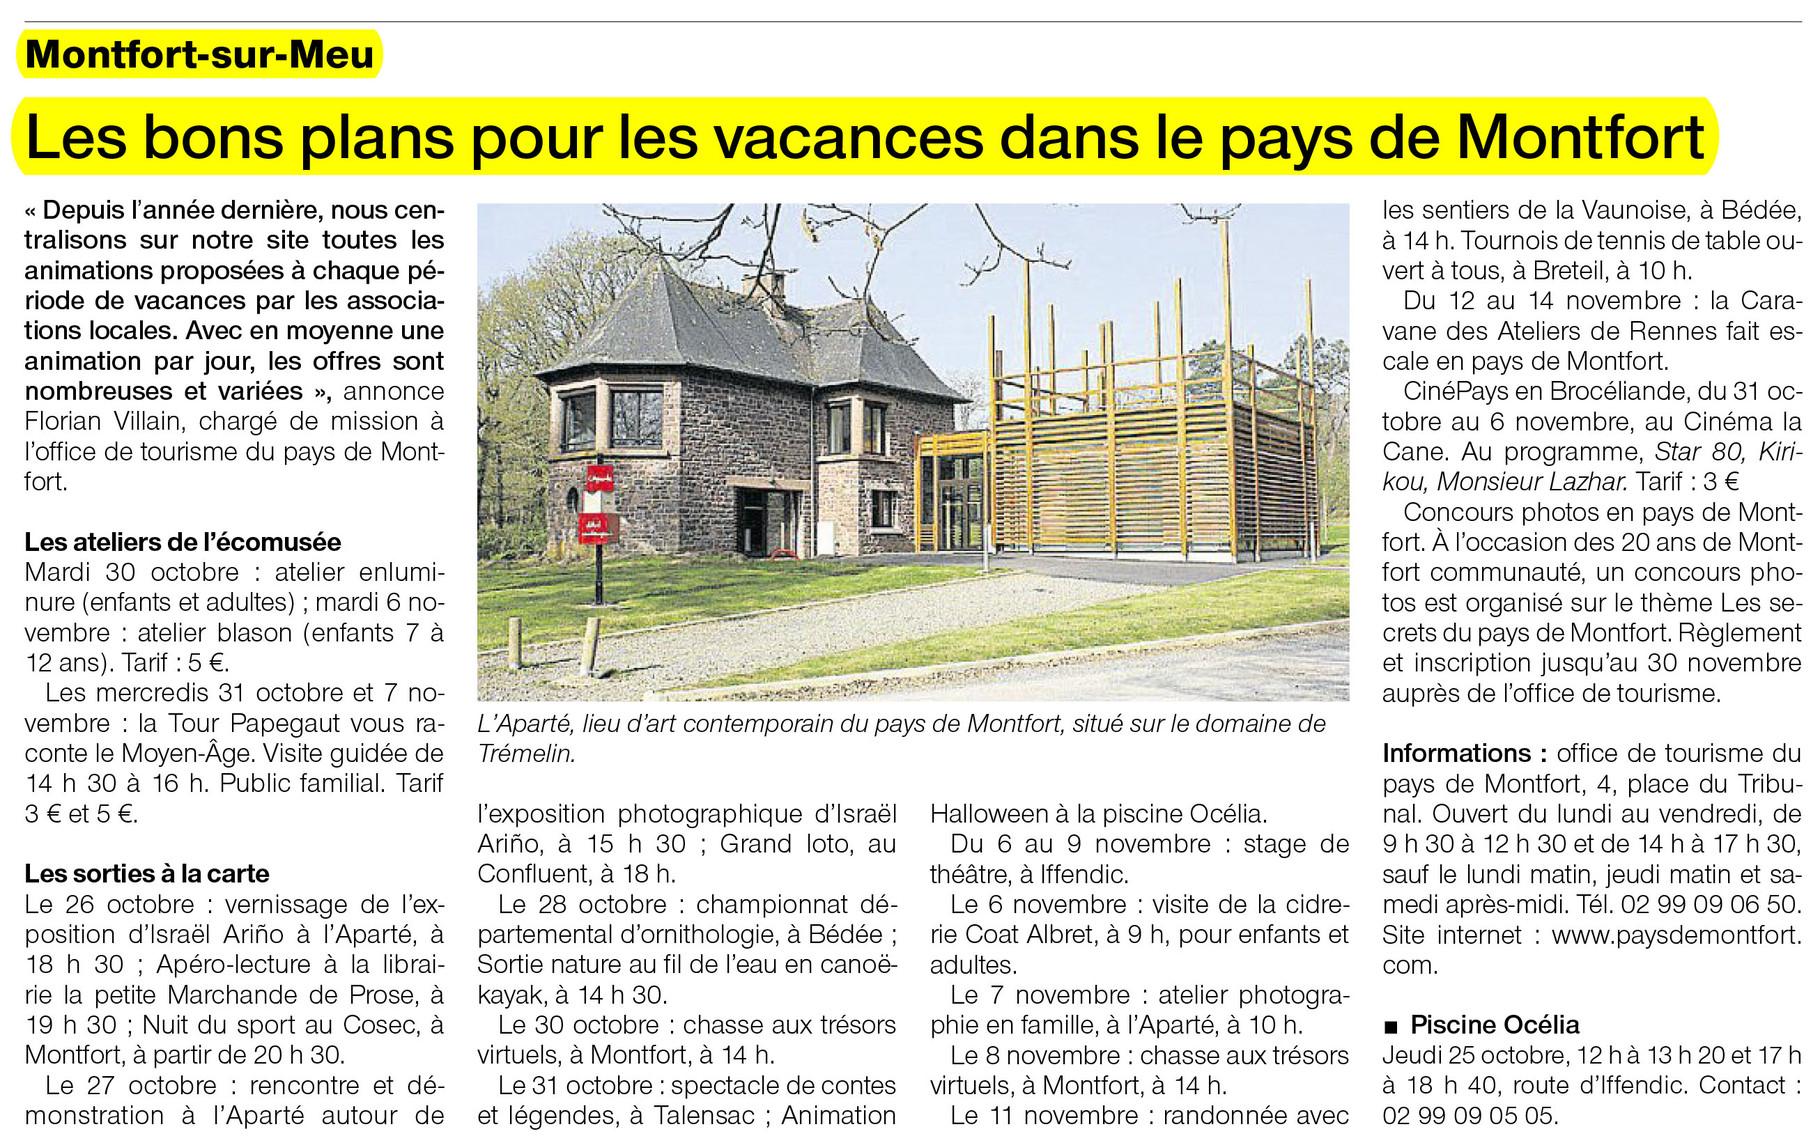 Ouest-France - 25 octobre 2012